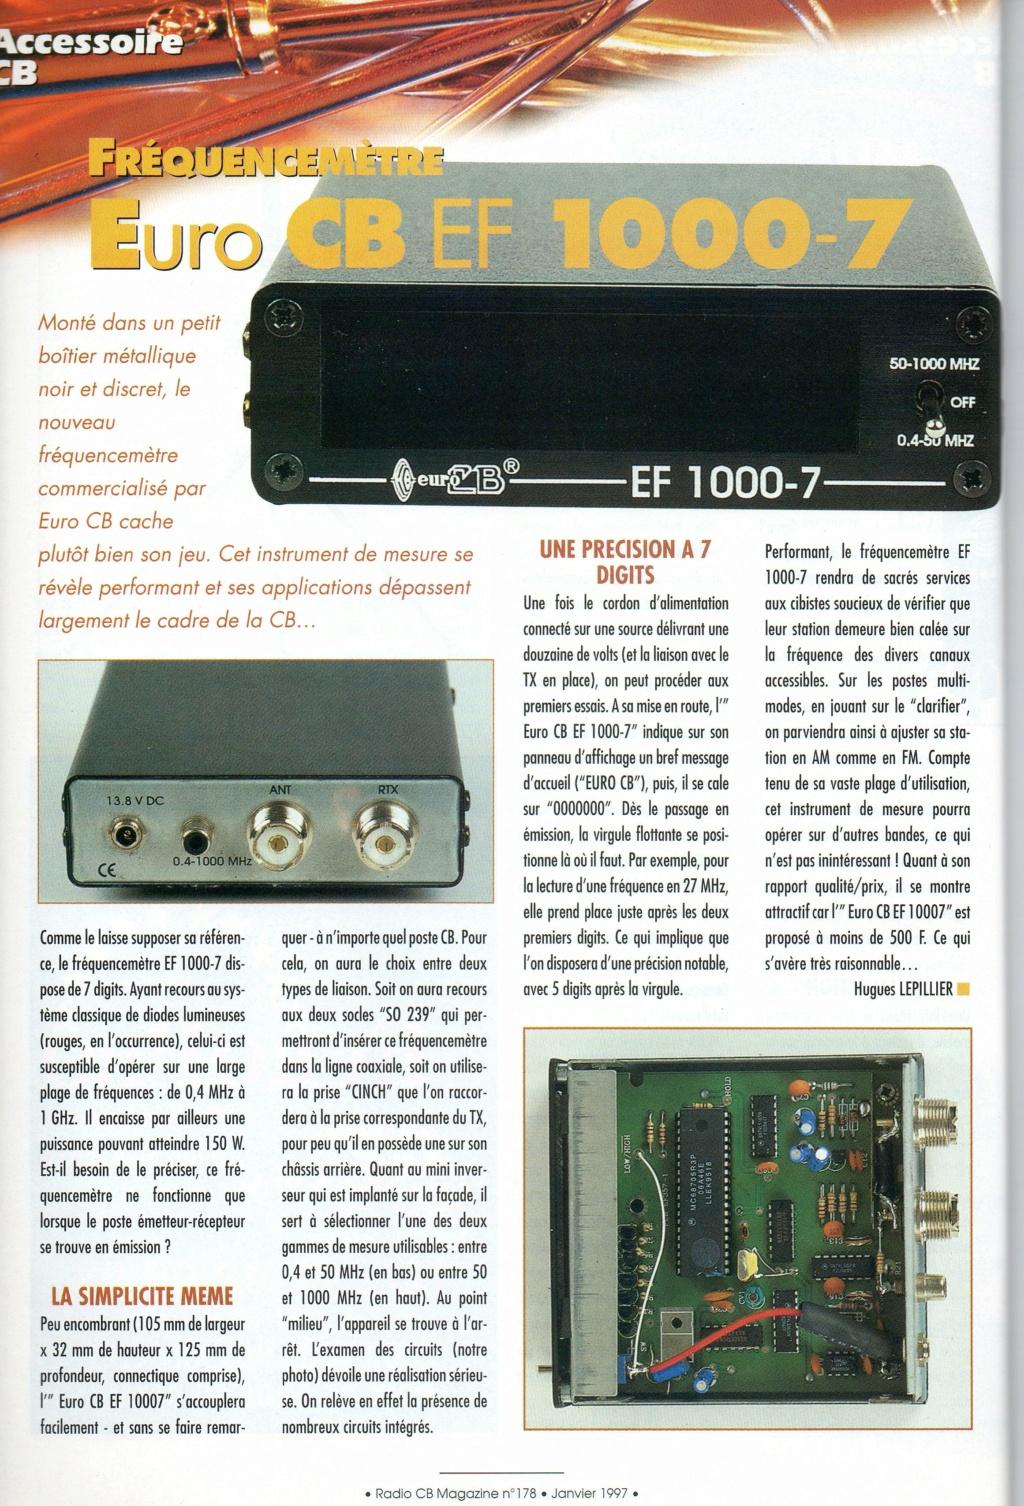 EF - EuroCB EF 1000-6 (Fréquencemètre) Chora298